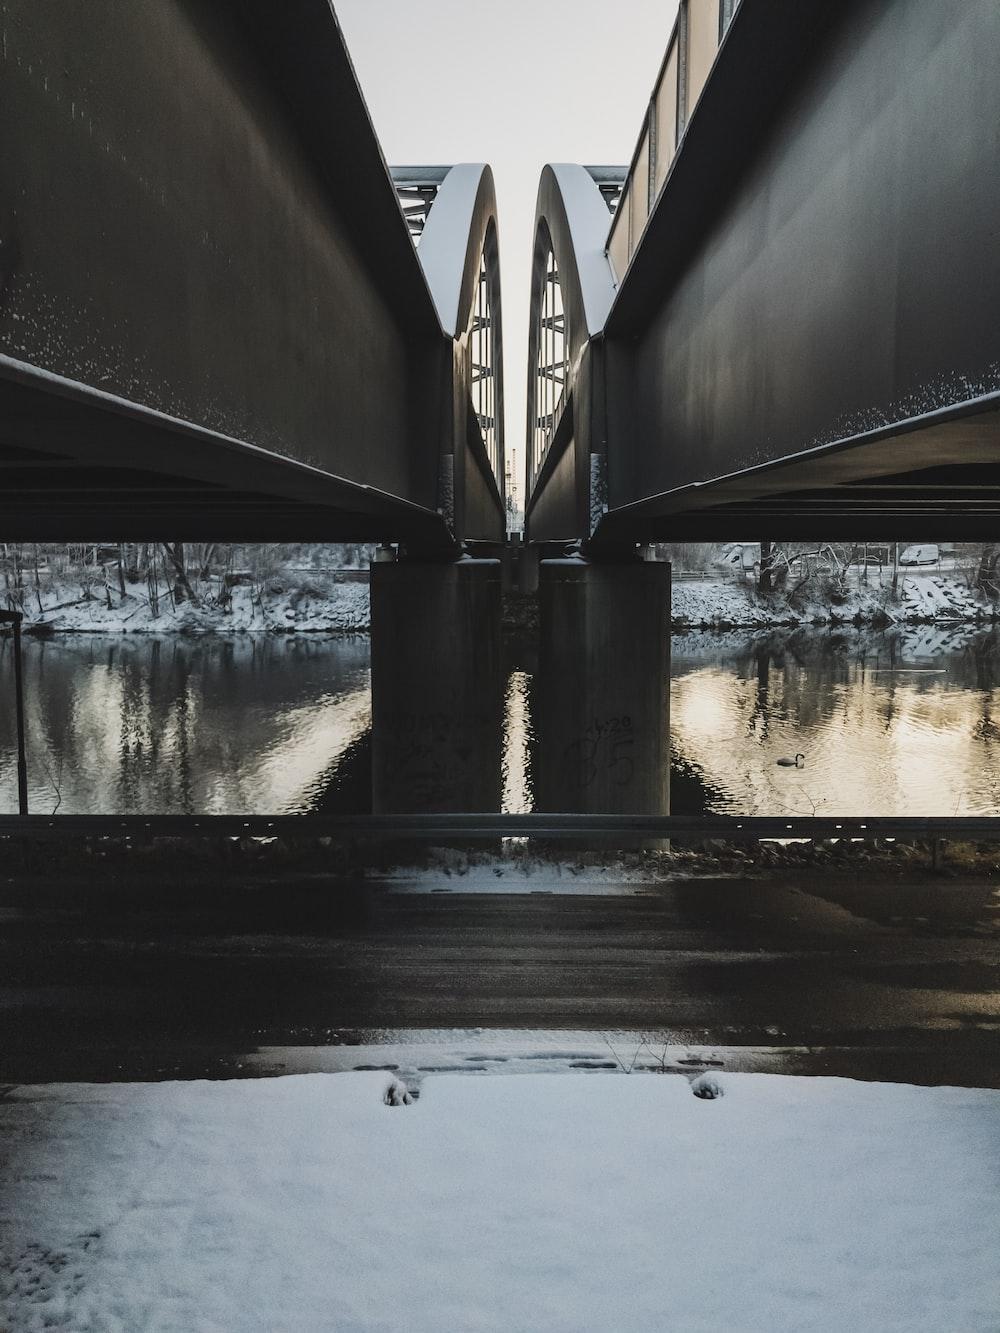 river under bridge at daytime